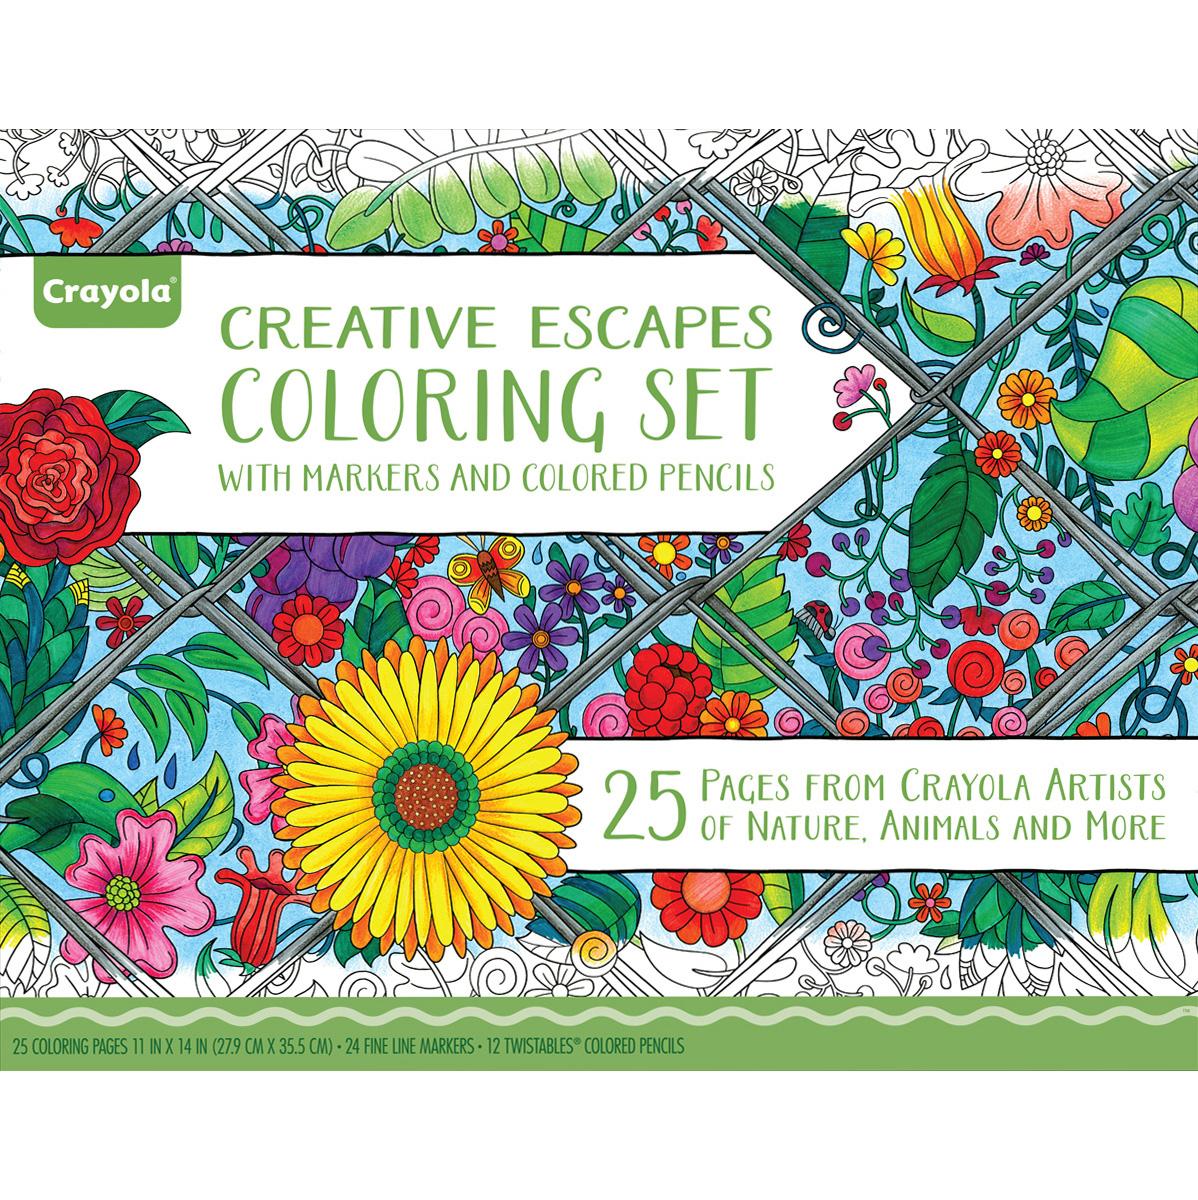 Crayola Coloring Set W/Markers & Colored Pencils - NOTM403288 ...